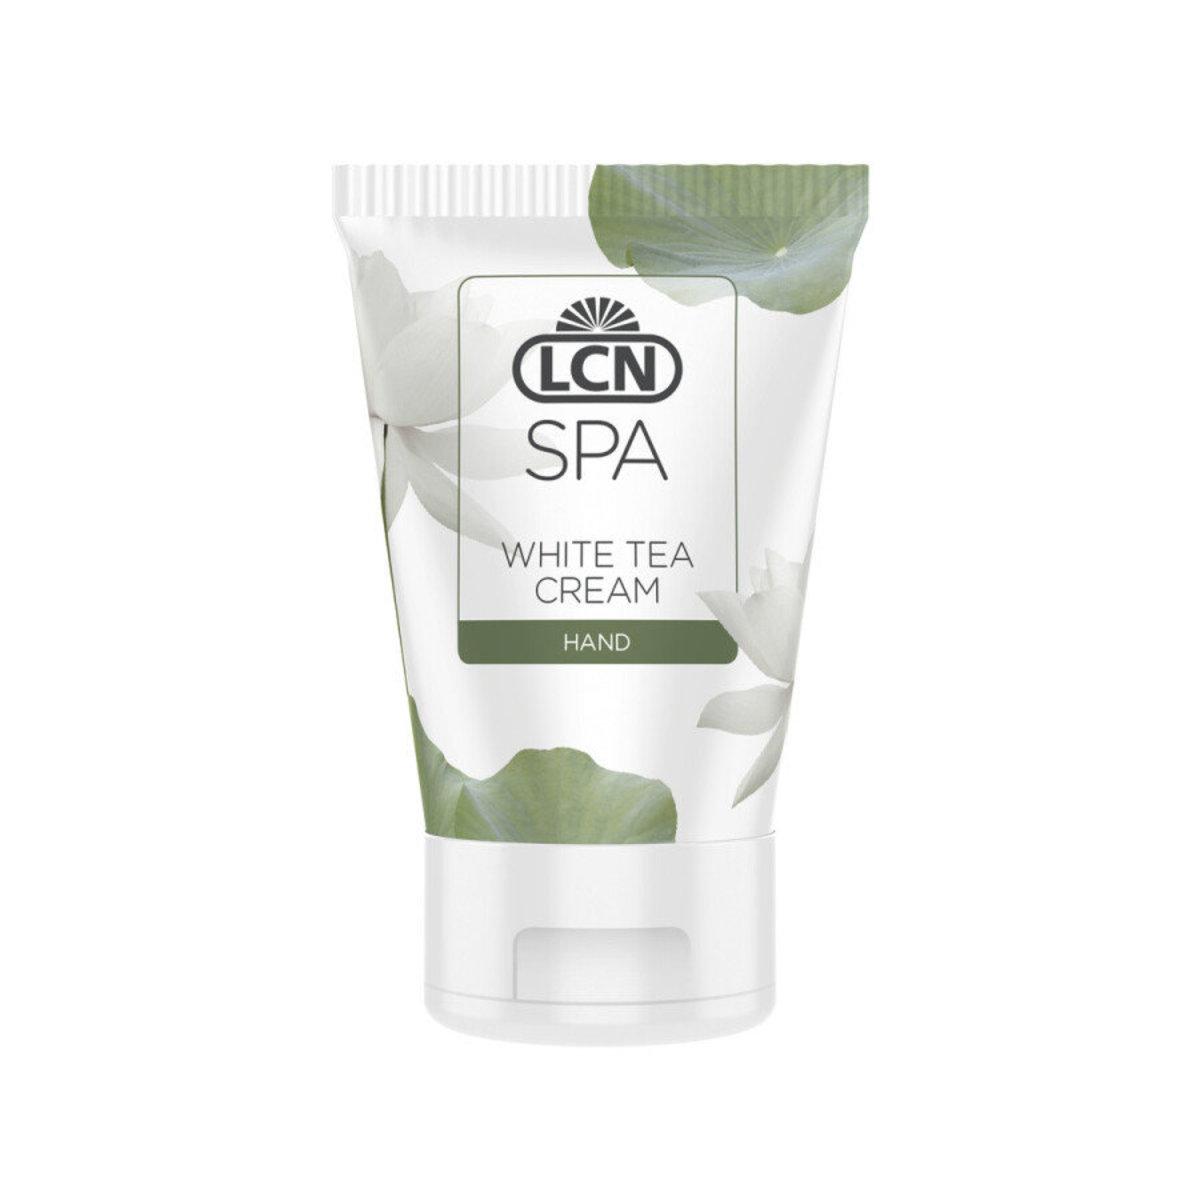 LCN SPA White Tea Cream,30ml